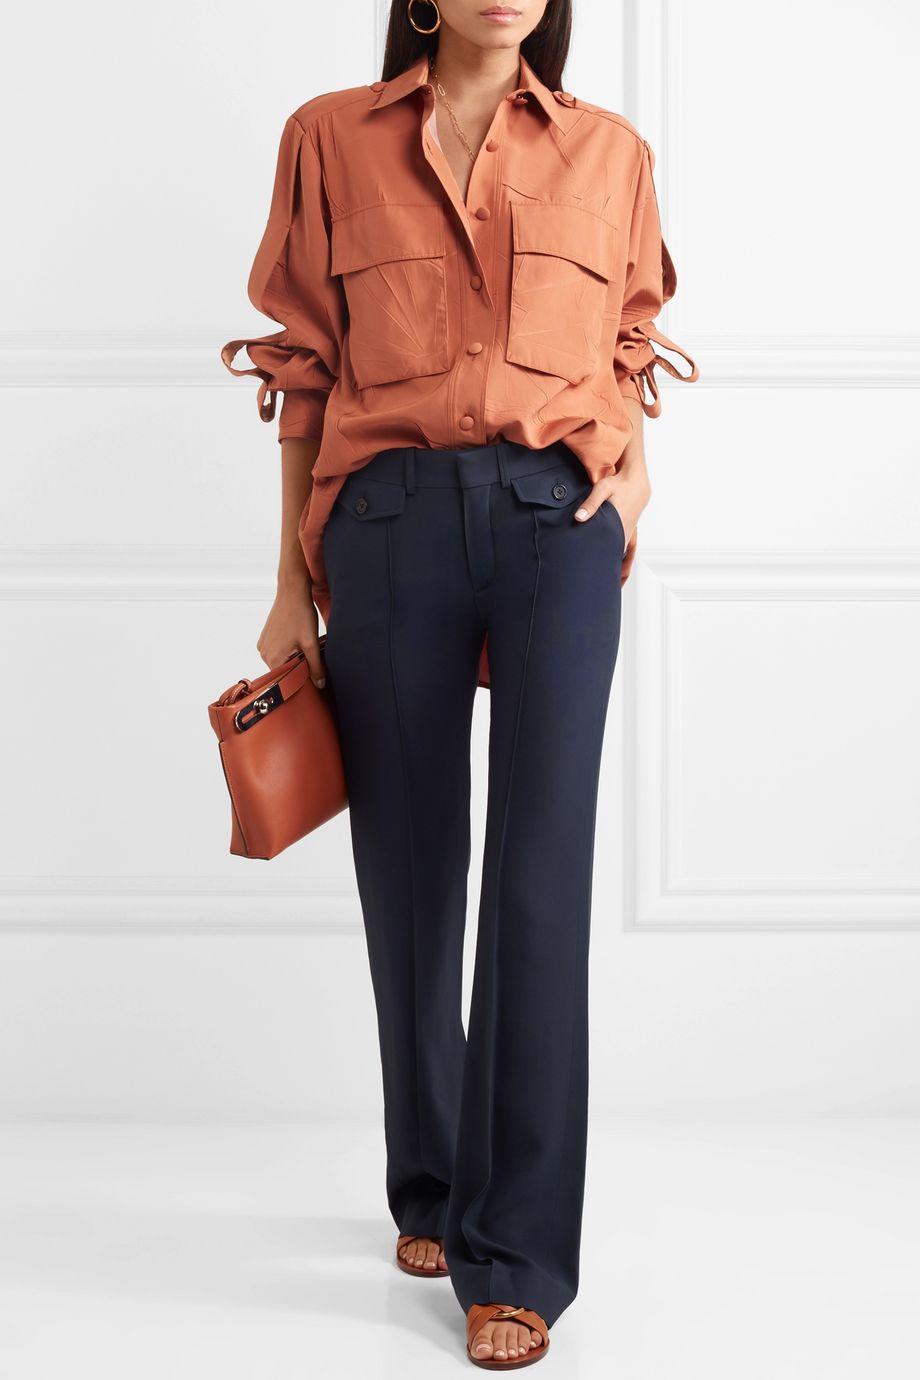 Chloé Cady wide-leg pants